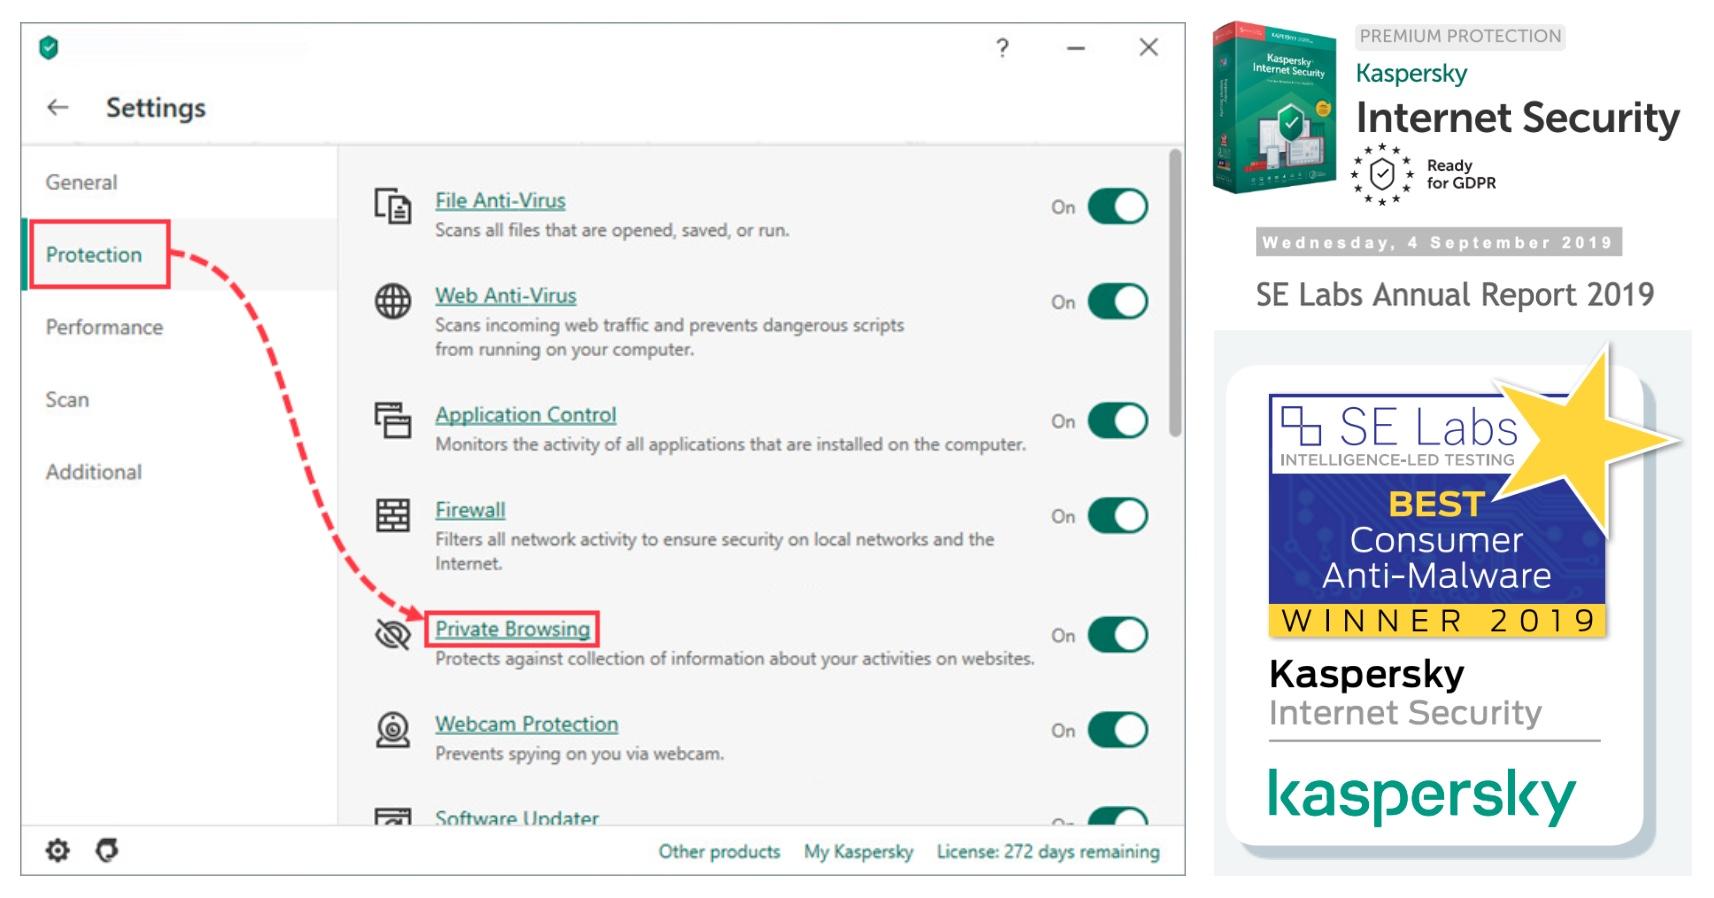 Kaspersky-Best-Consumer-Anti-Malware